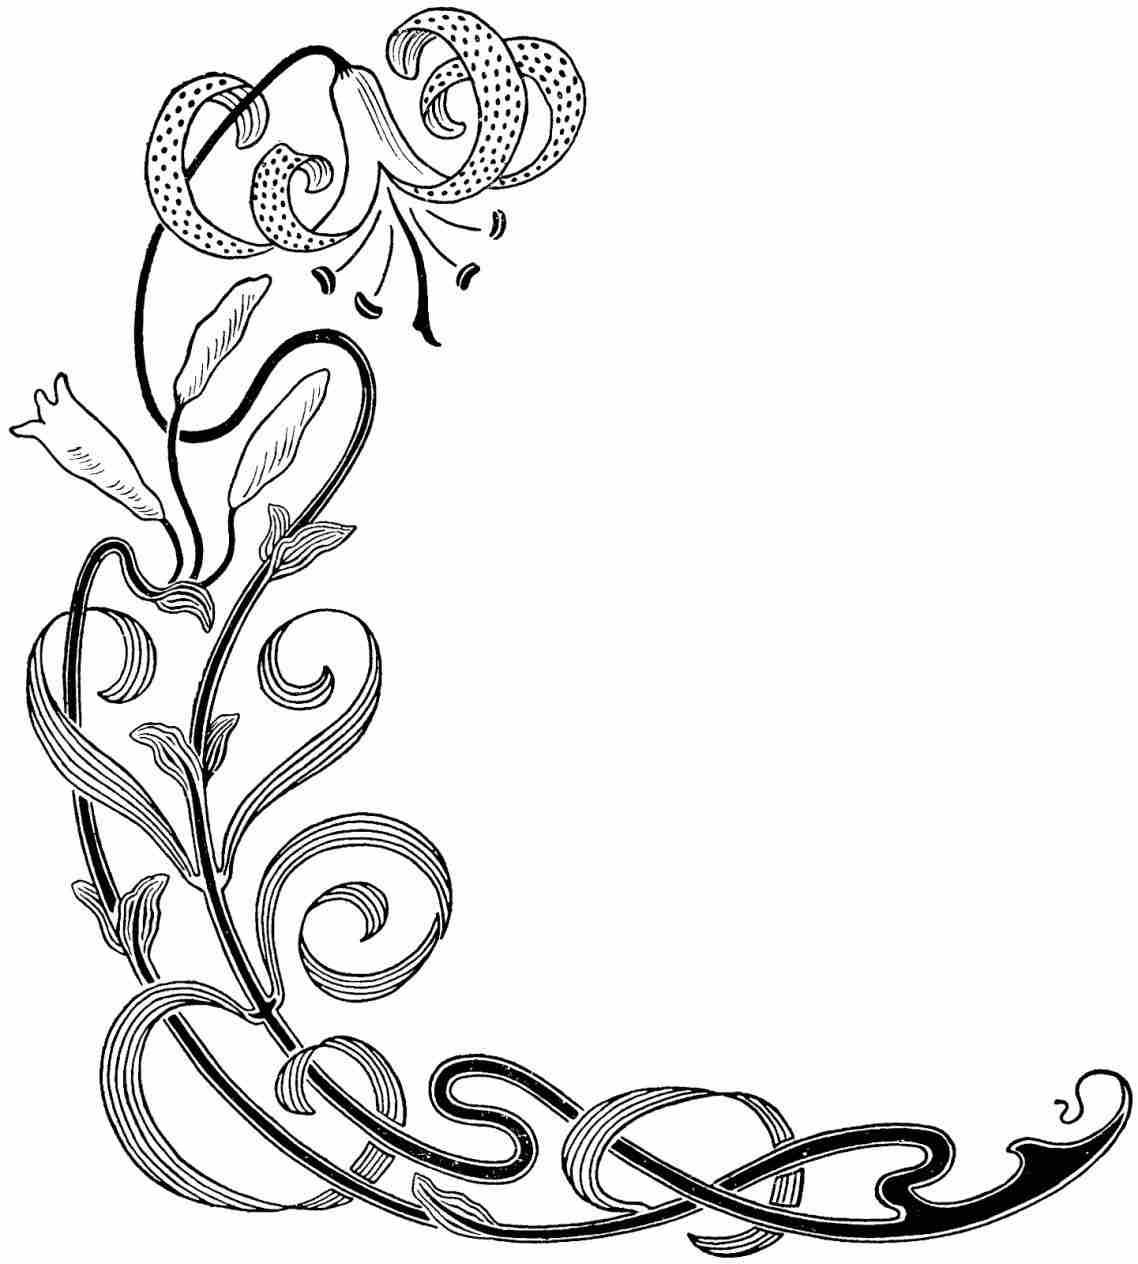 1138x1264 Religious Christmas Free Flower Border Clip Art Black And White